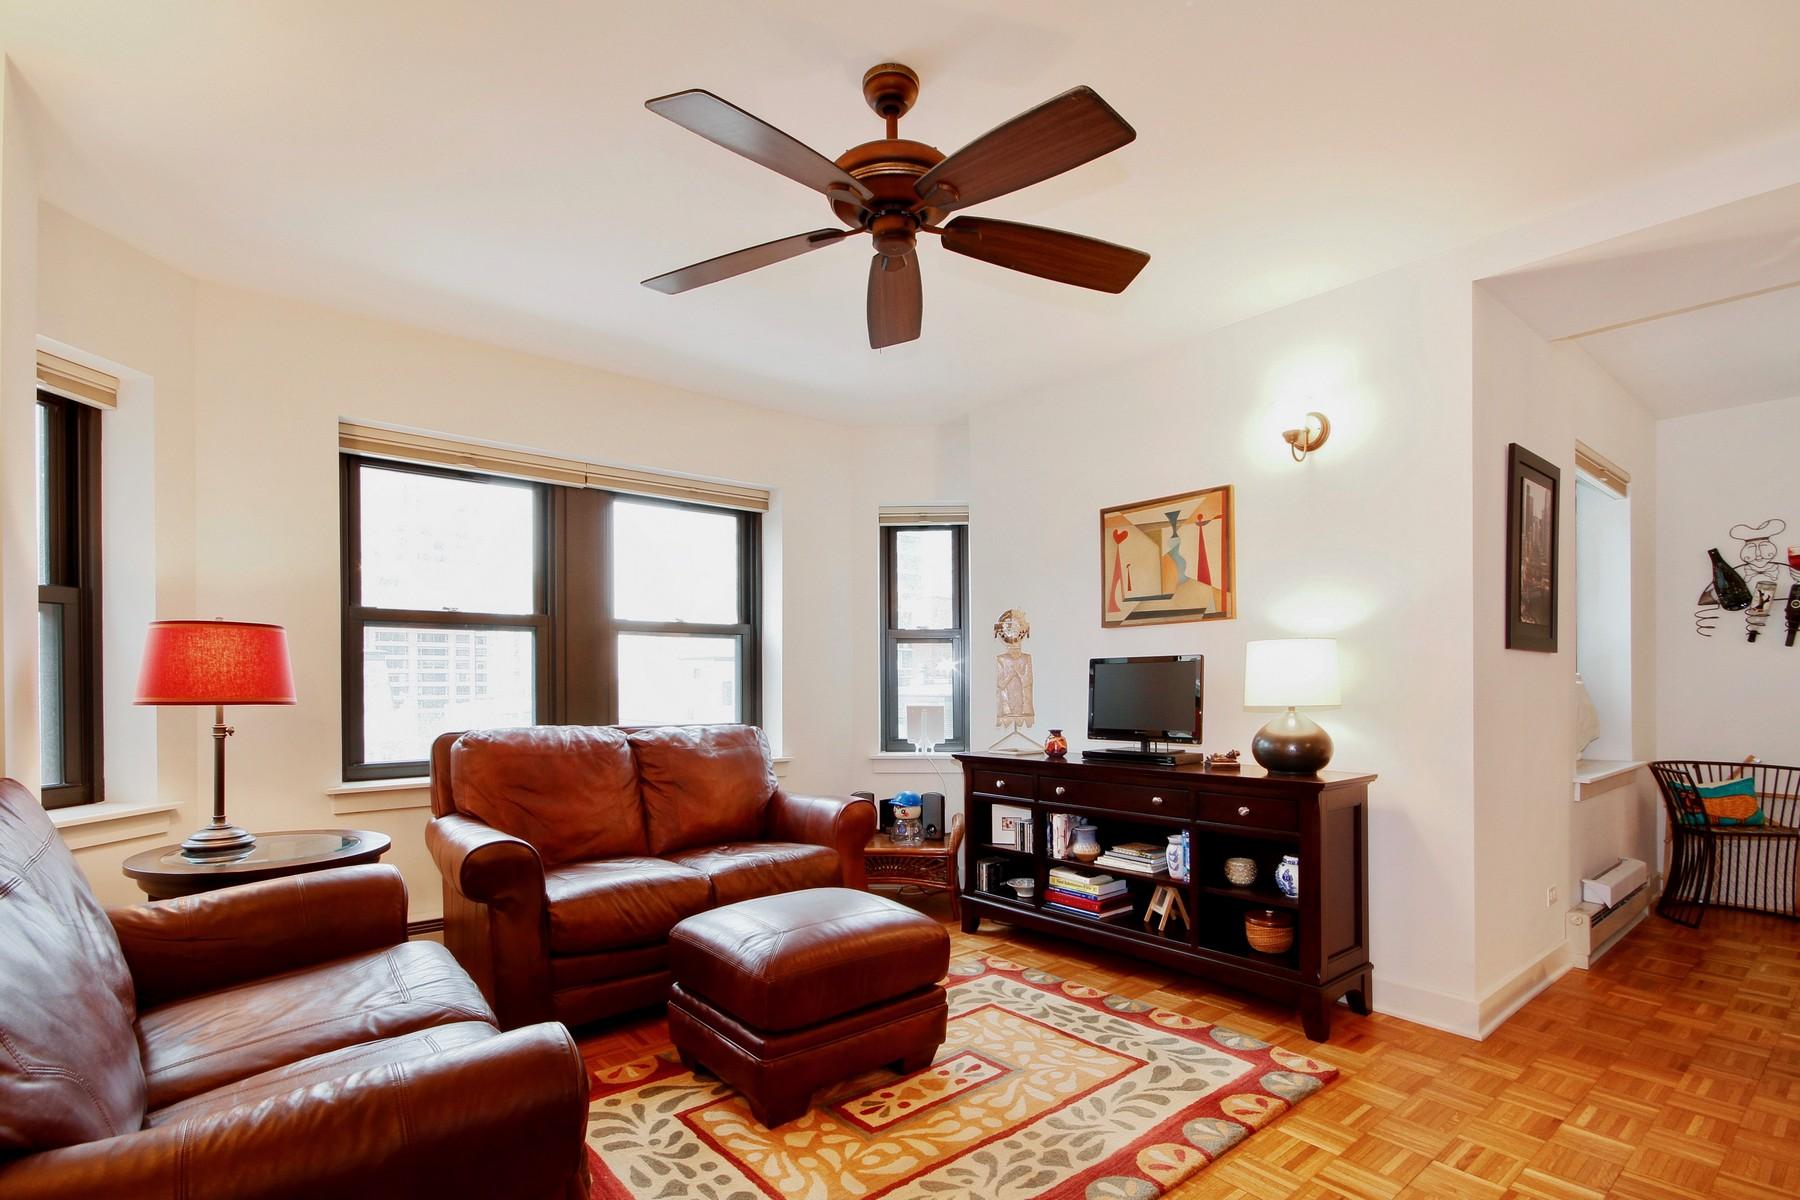 Nhà chung cư vì Bán tại Gold Coast Apartment 1400 N Lake Shore Drive Unit 8O Near North Side, Chicago, Illinois, 60610 Hoa Kỳ